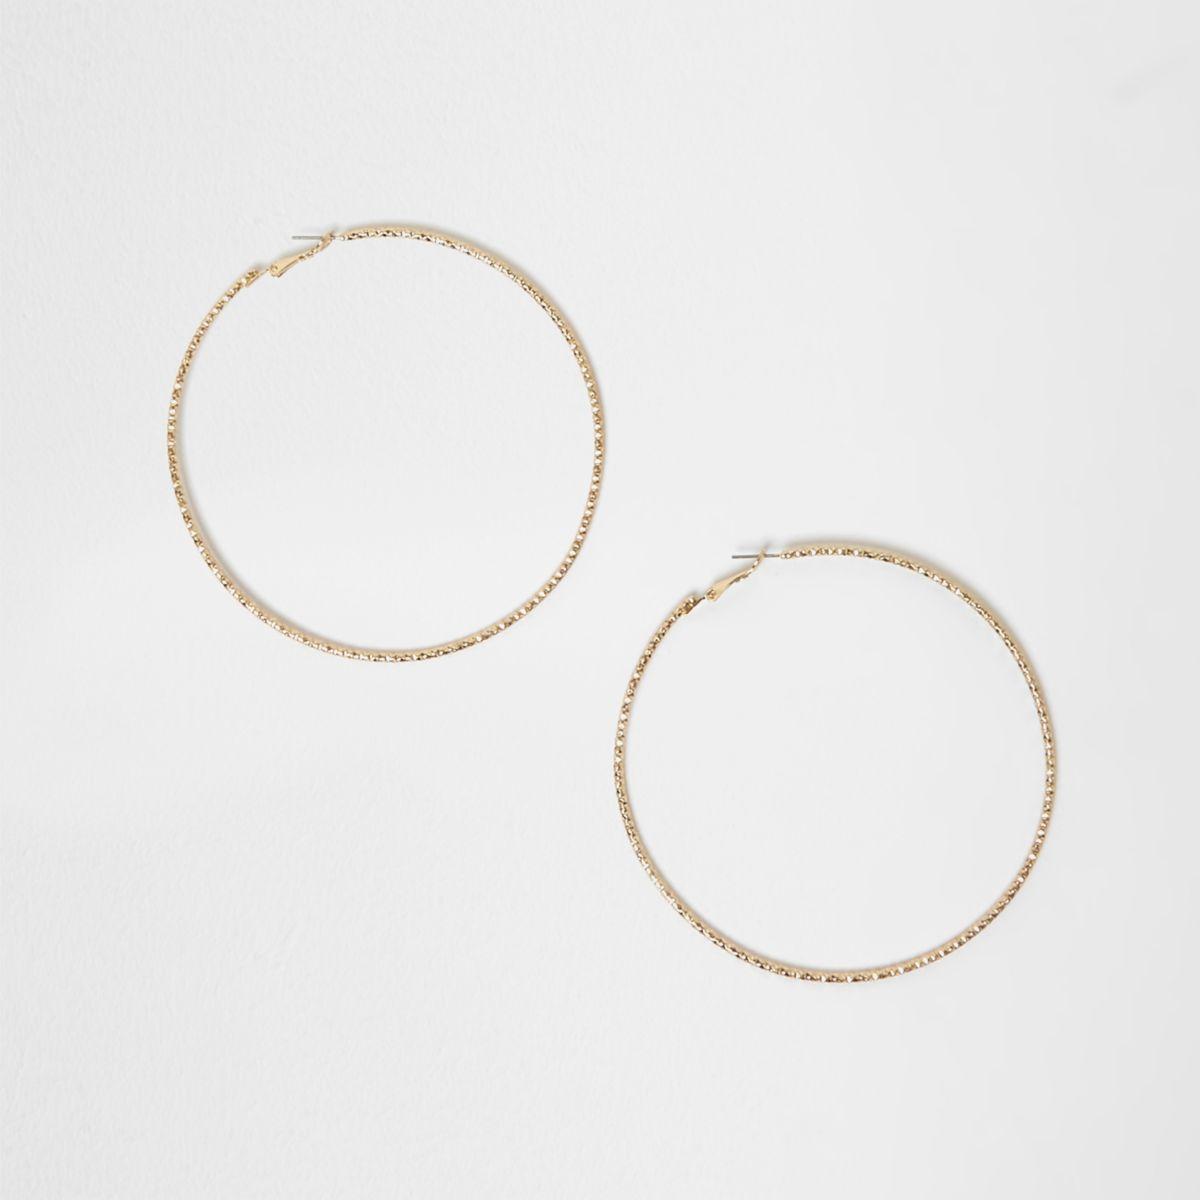 Gold tone faceted oversized hoop earrings